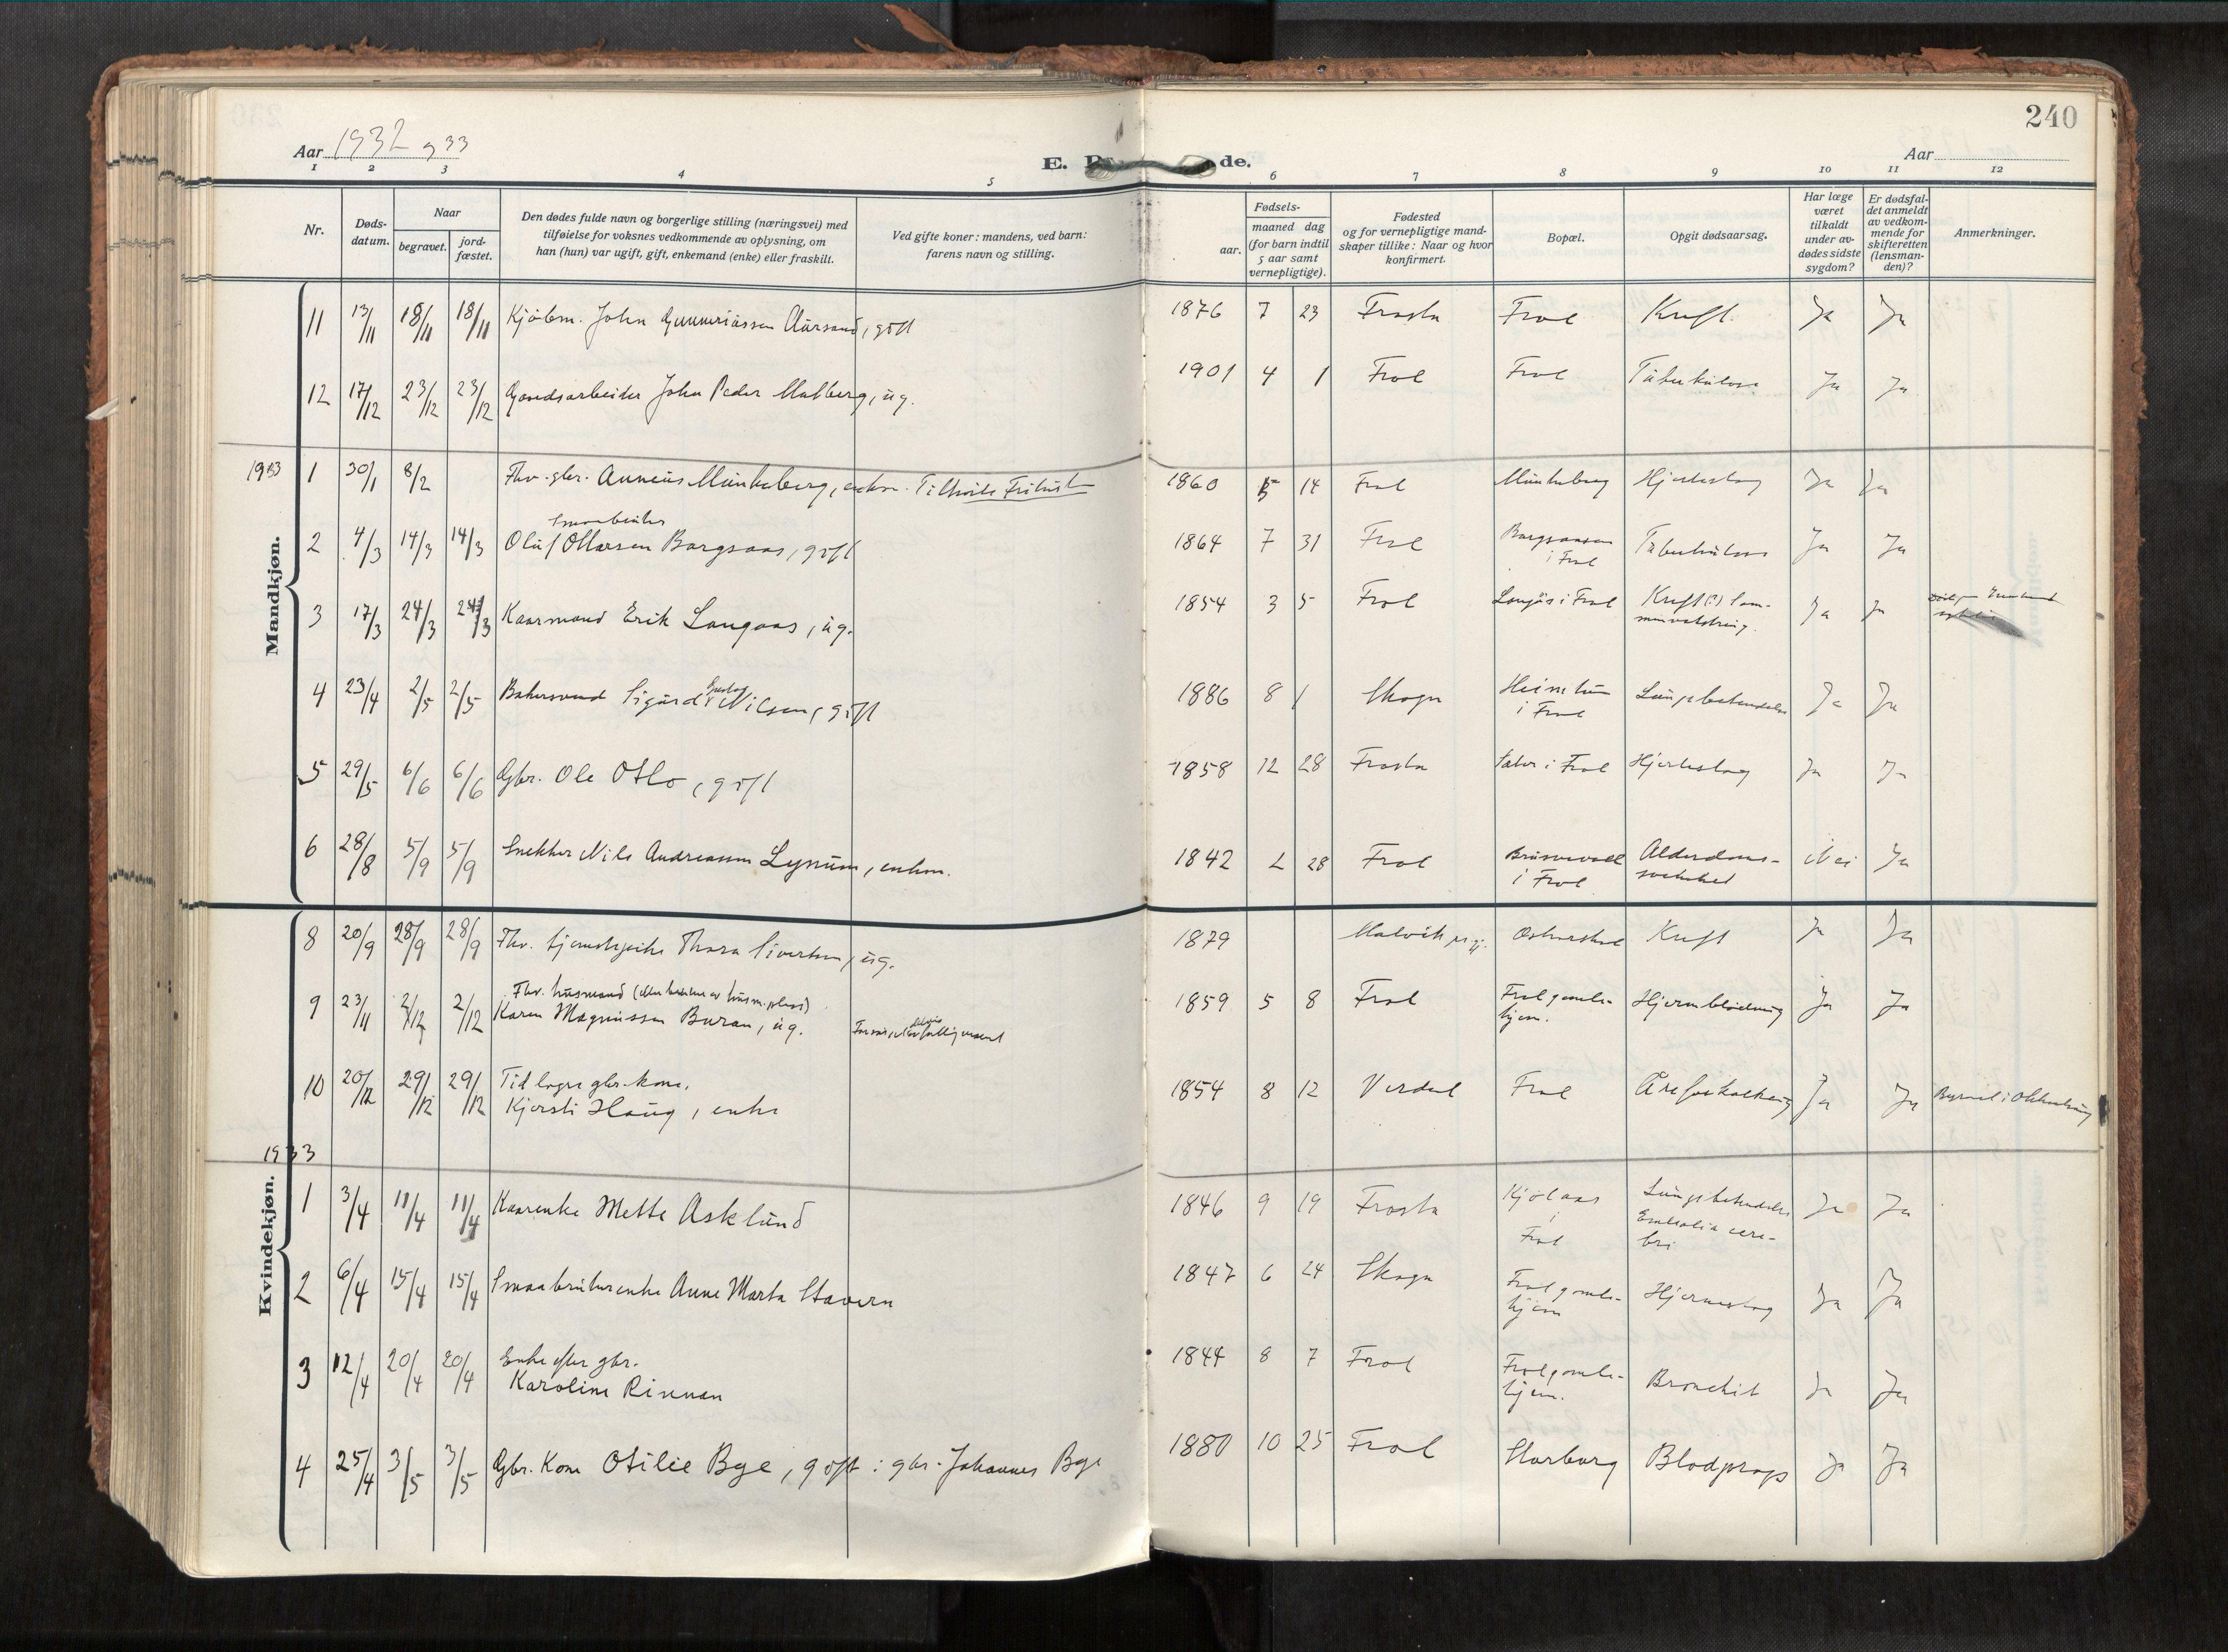 SAT, Levanger sokneprestkontor*, Parish register (official) no. 1, 1912-1935, p. 240